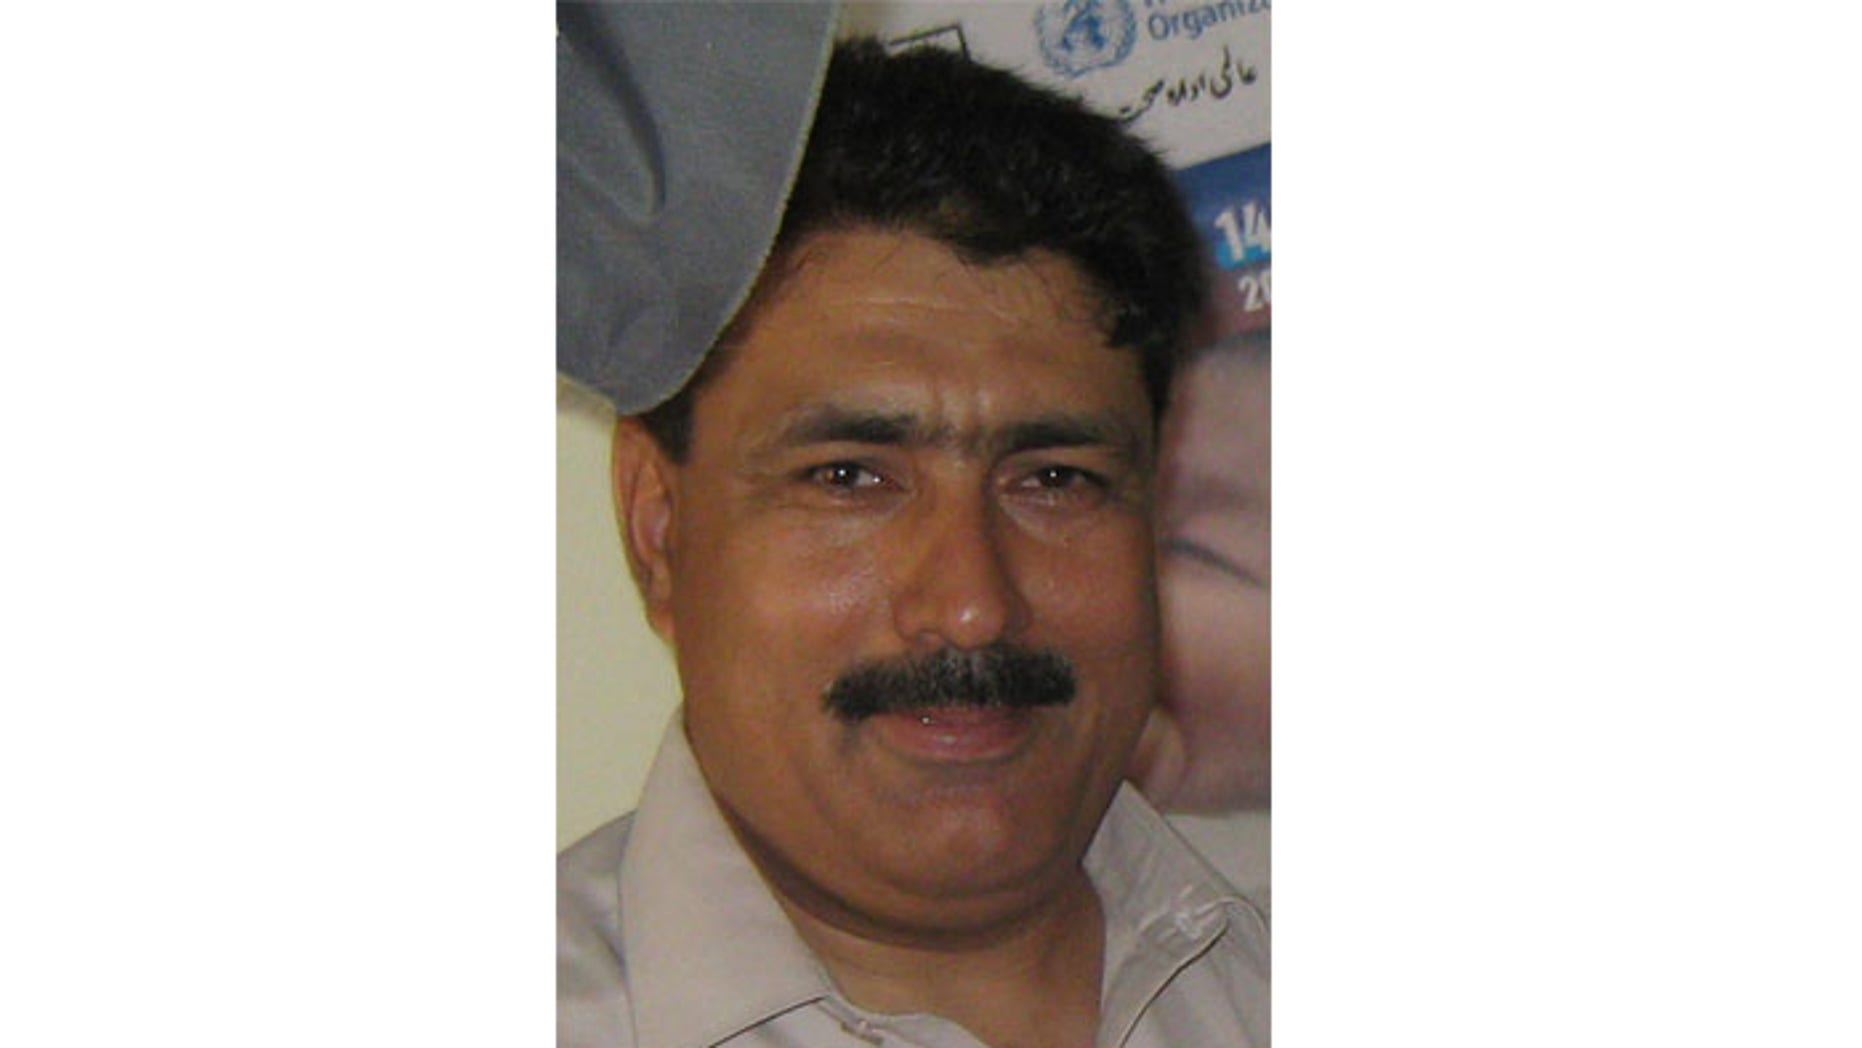 This photo taken on July 9, 2010 shows Pakistani doctor Shakil Afridi taken in Pakistani tribal area of Jamrud in Khyber region.